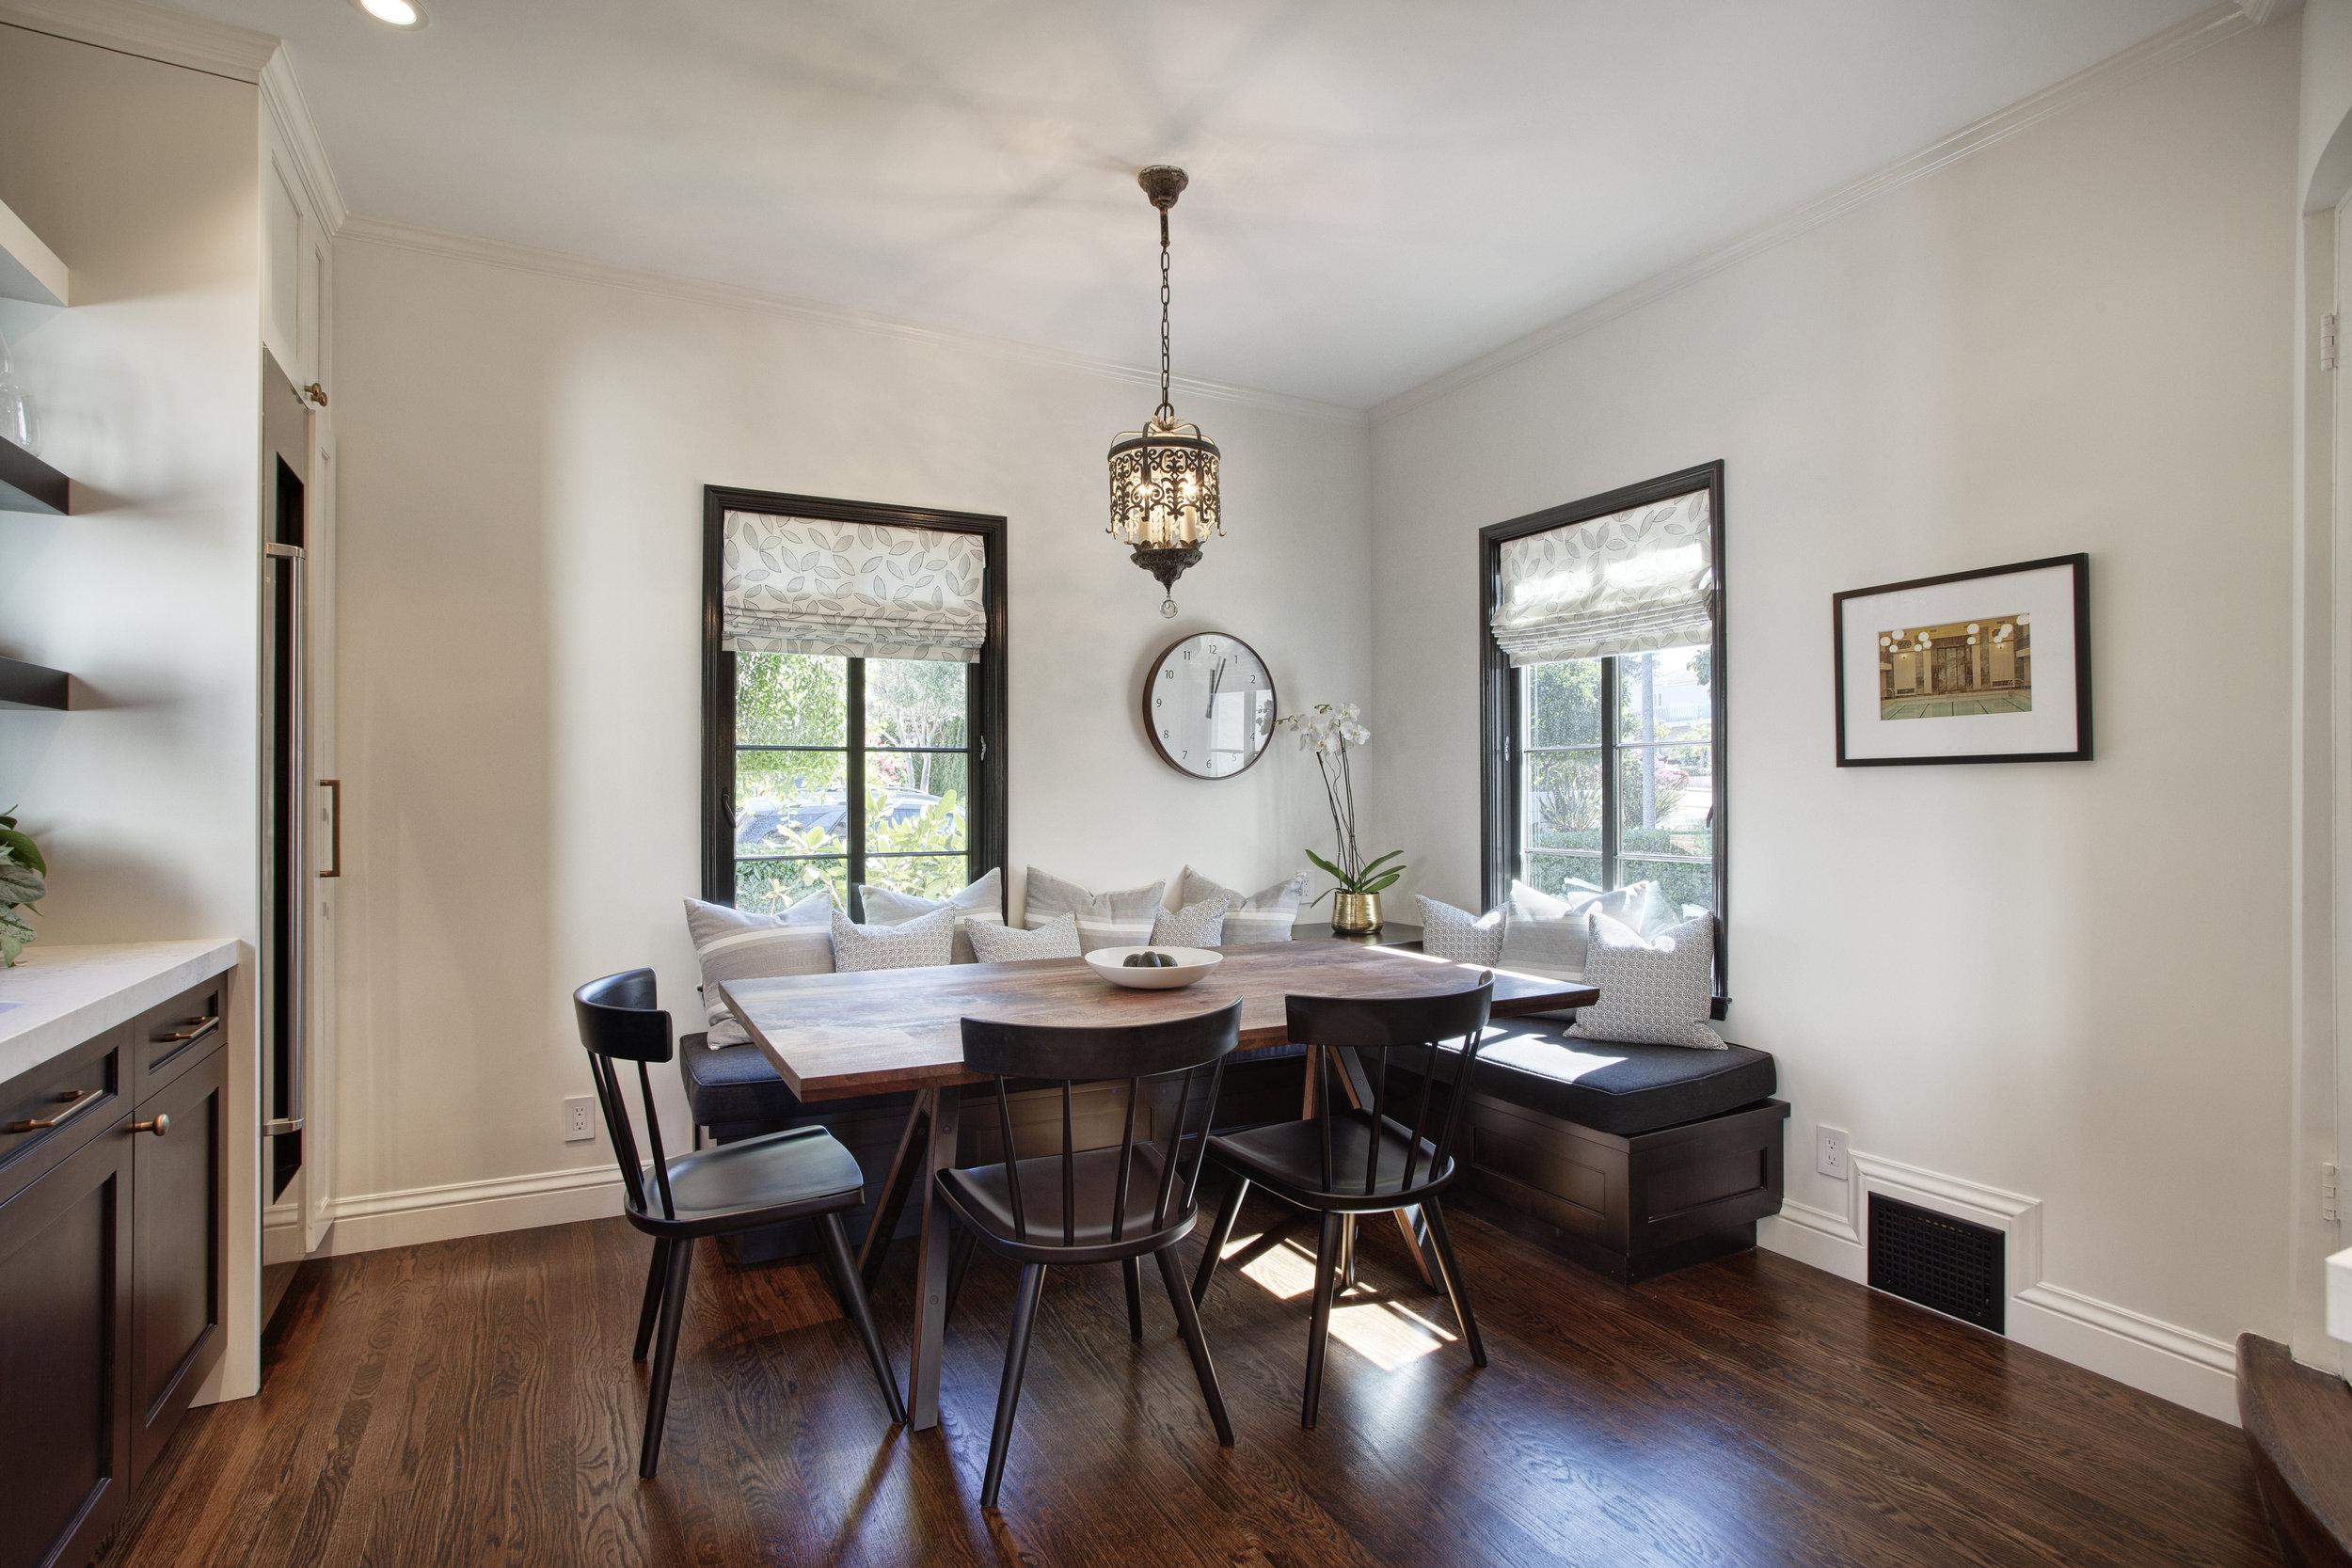 KJM interiors | banquette